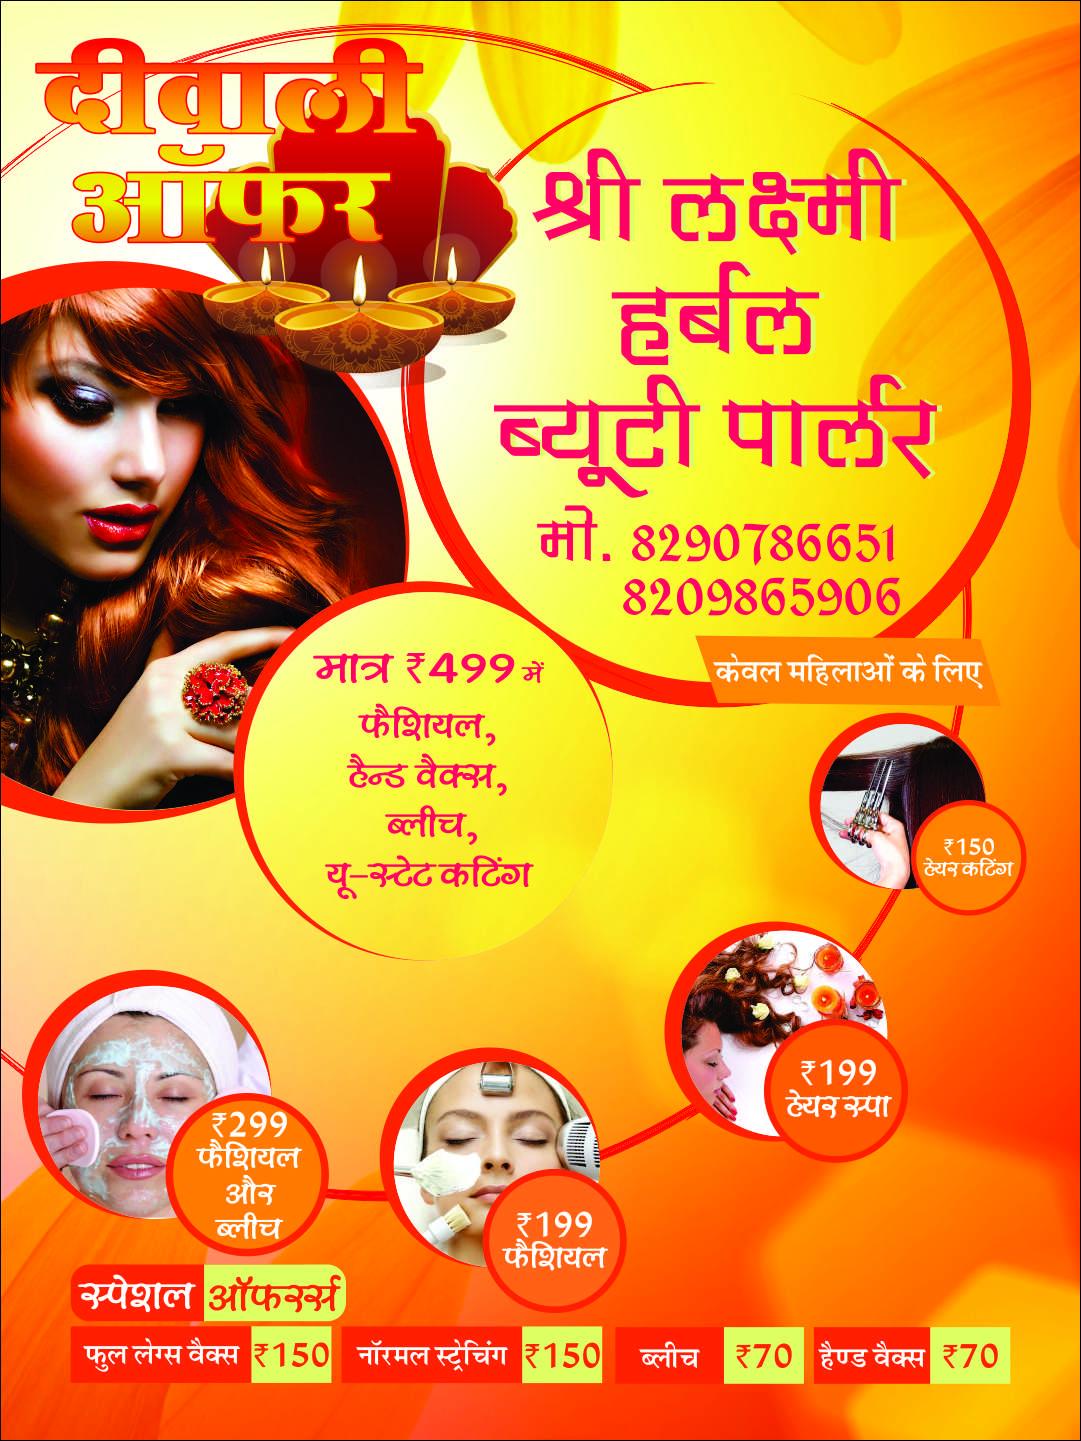 Imran Graphic Designer Jaipur Portfolio Indoor Outdoor Branding Customized Design Cnc Laser Cutting Beauty Parlor Offer Card Design By Imran Khan